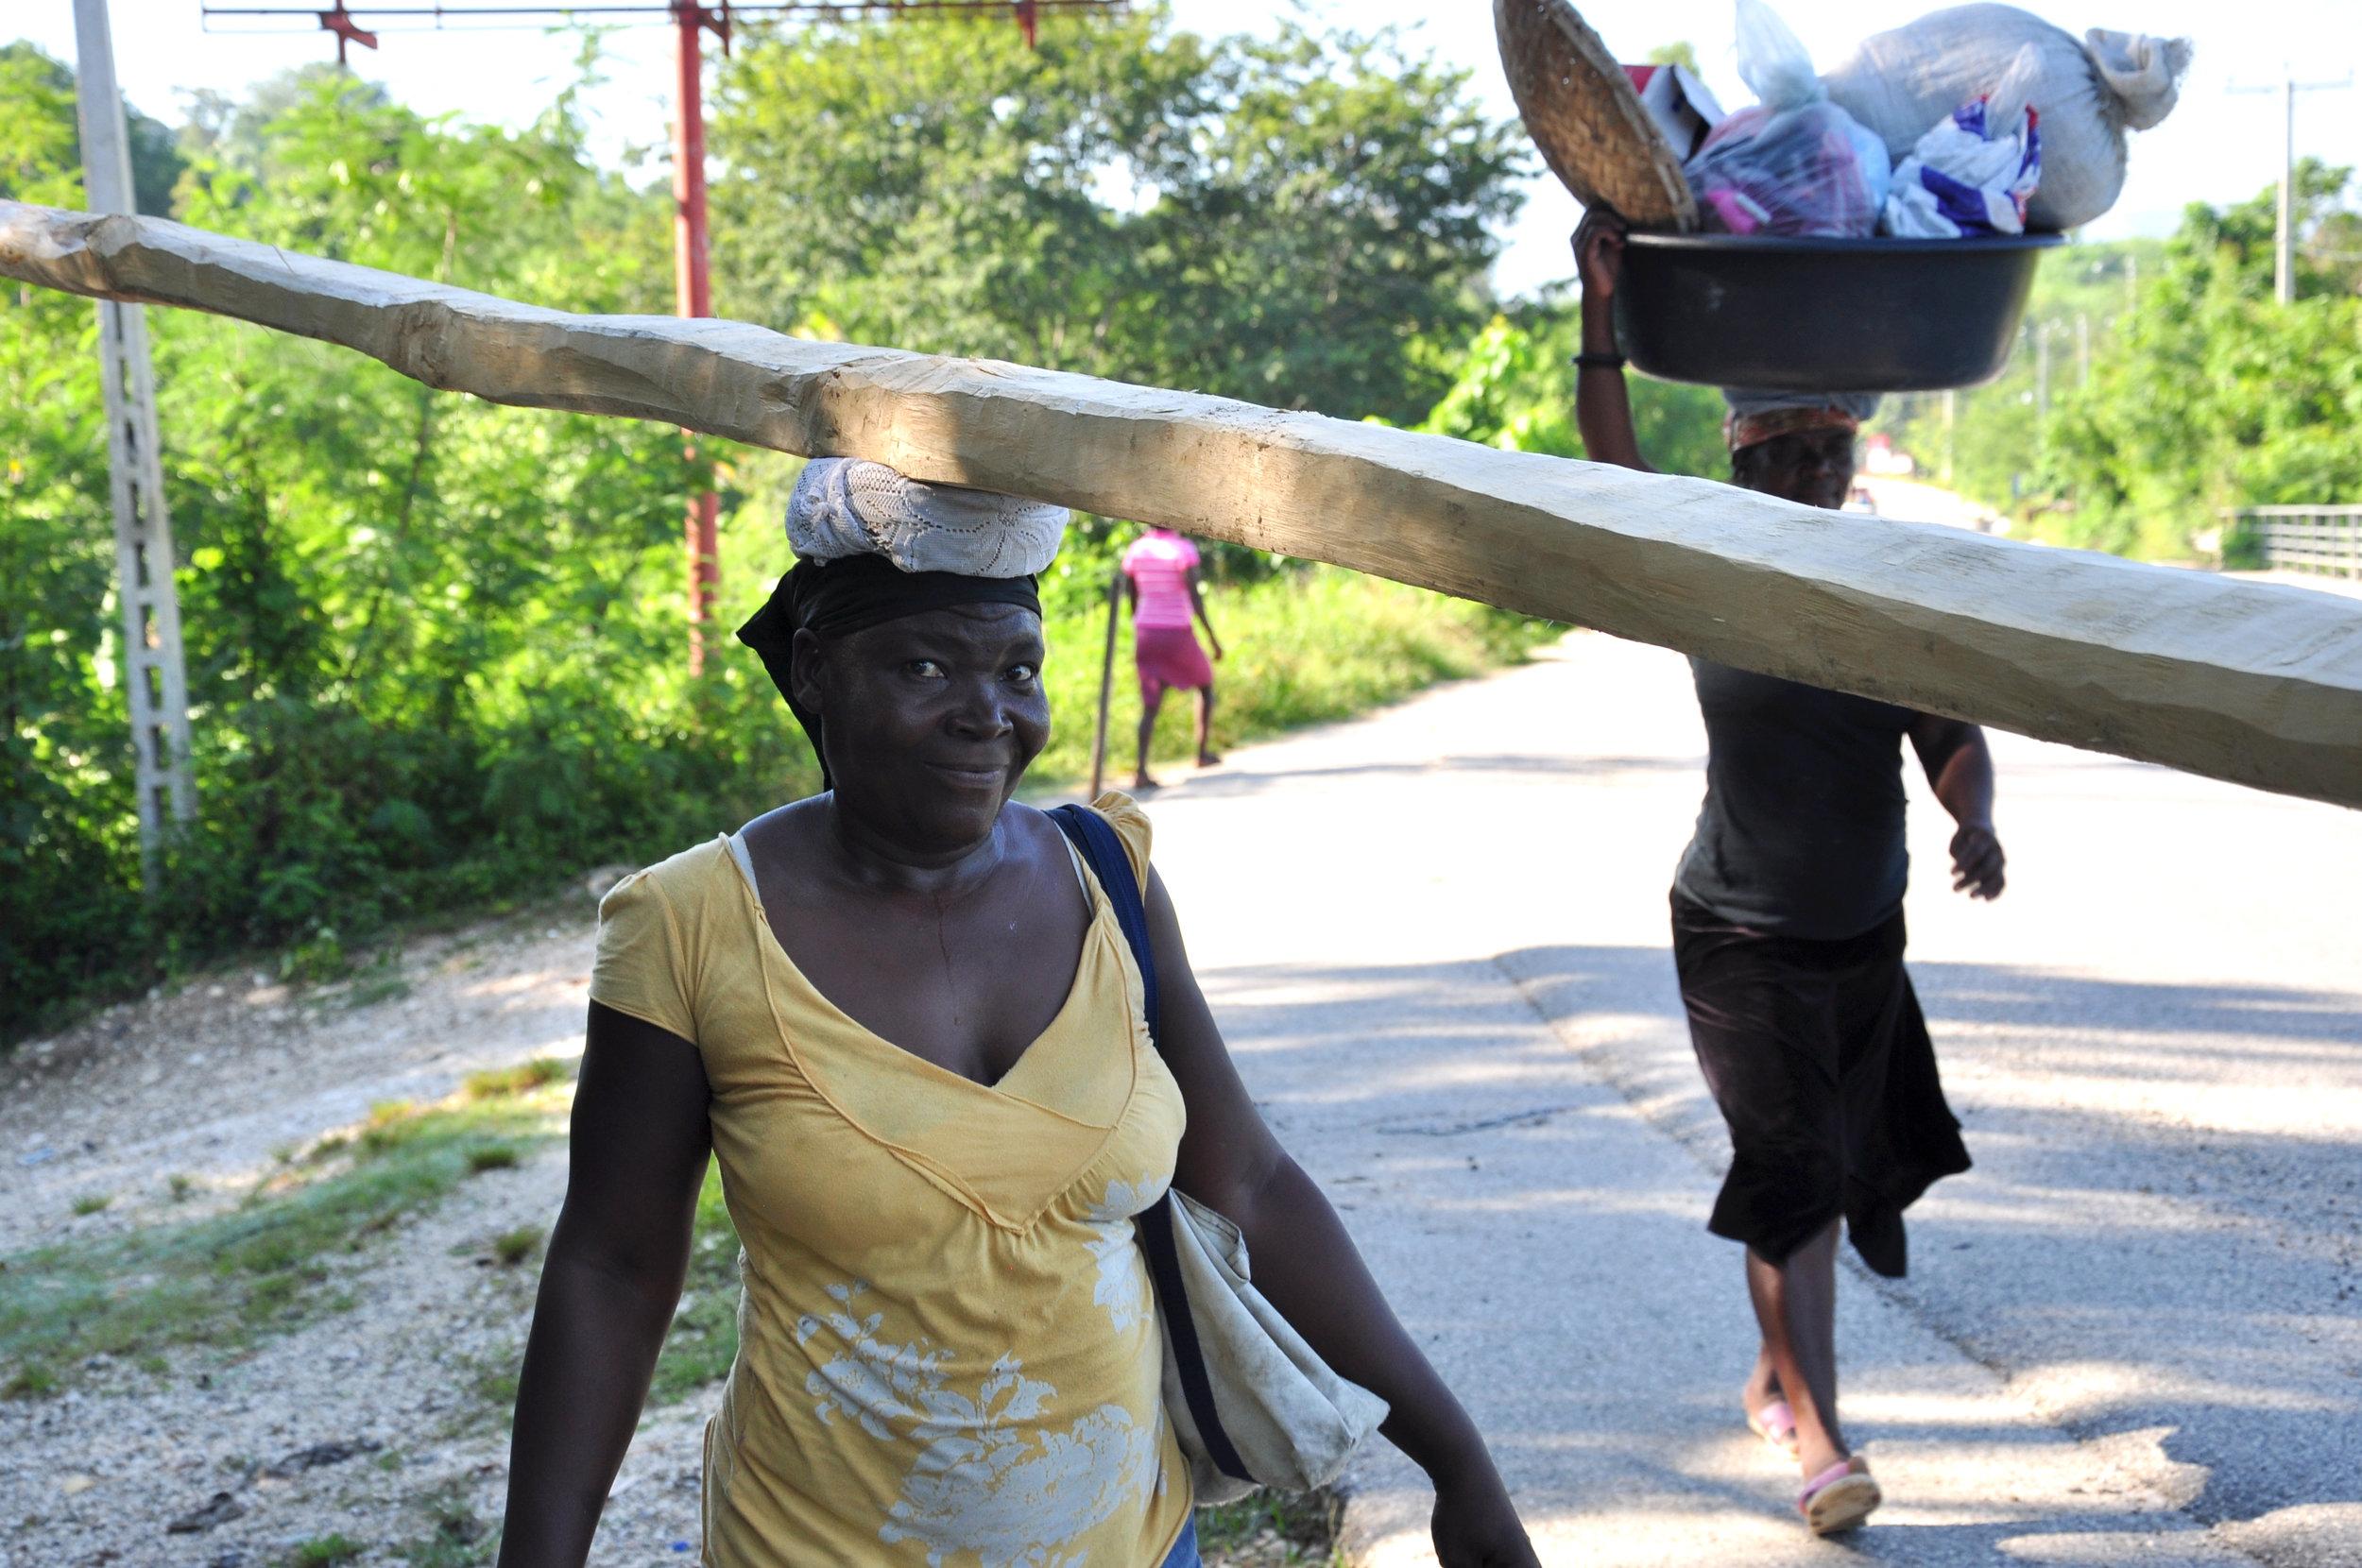 haiti cleaning.JPG